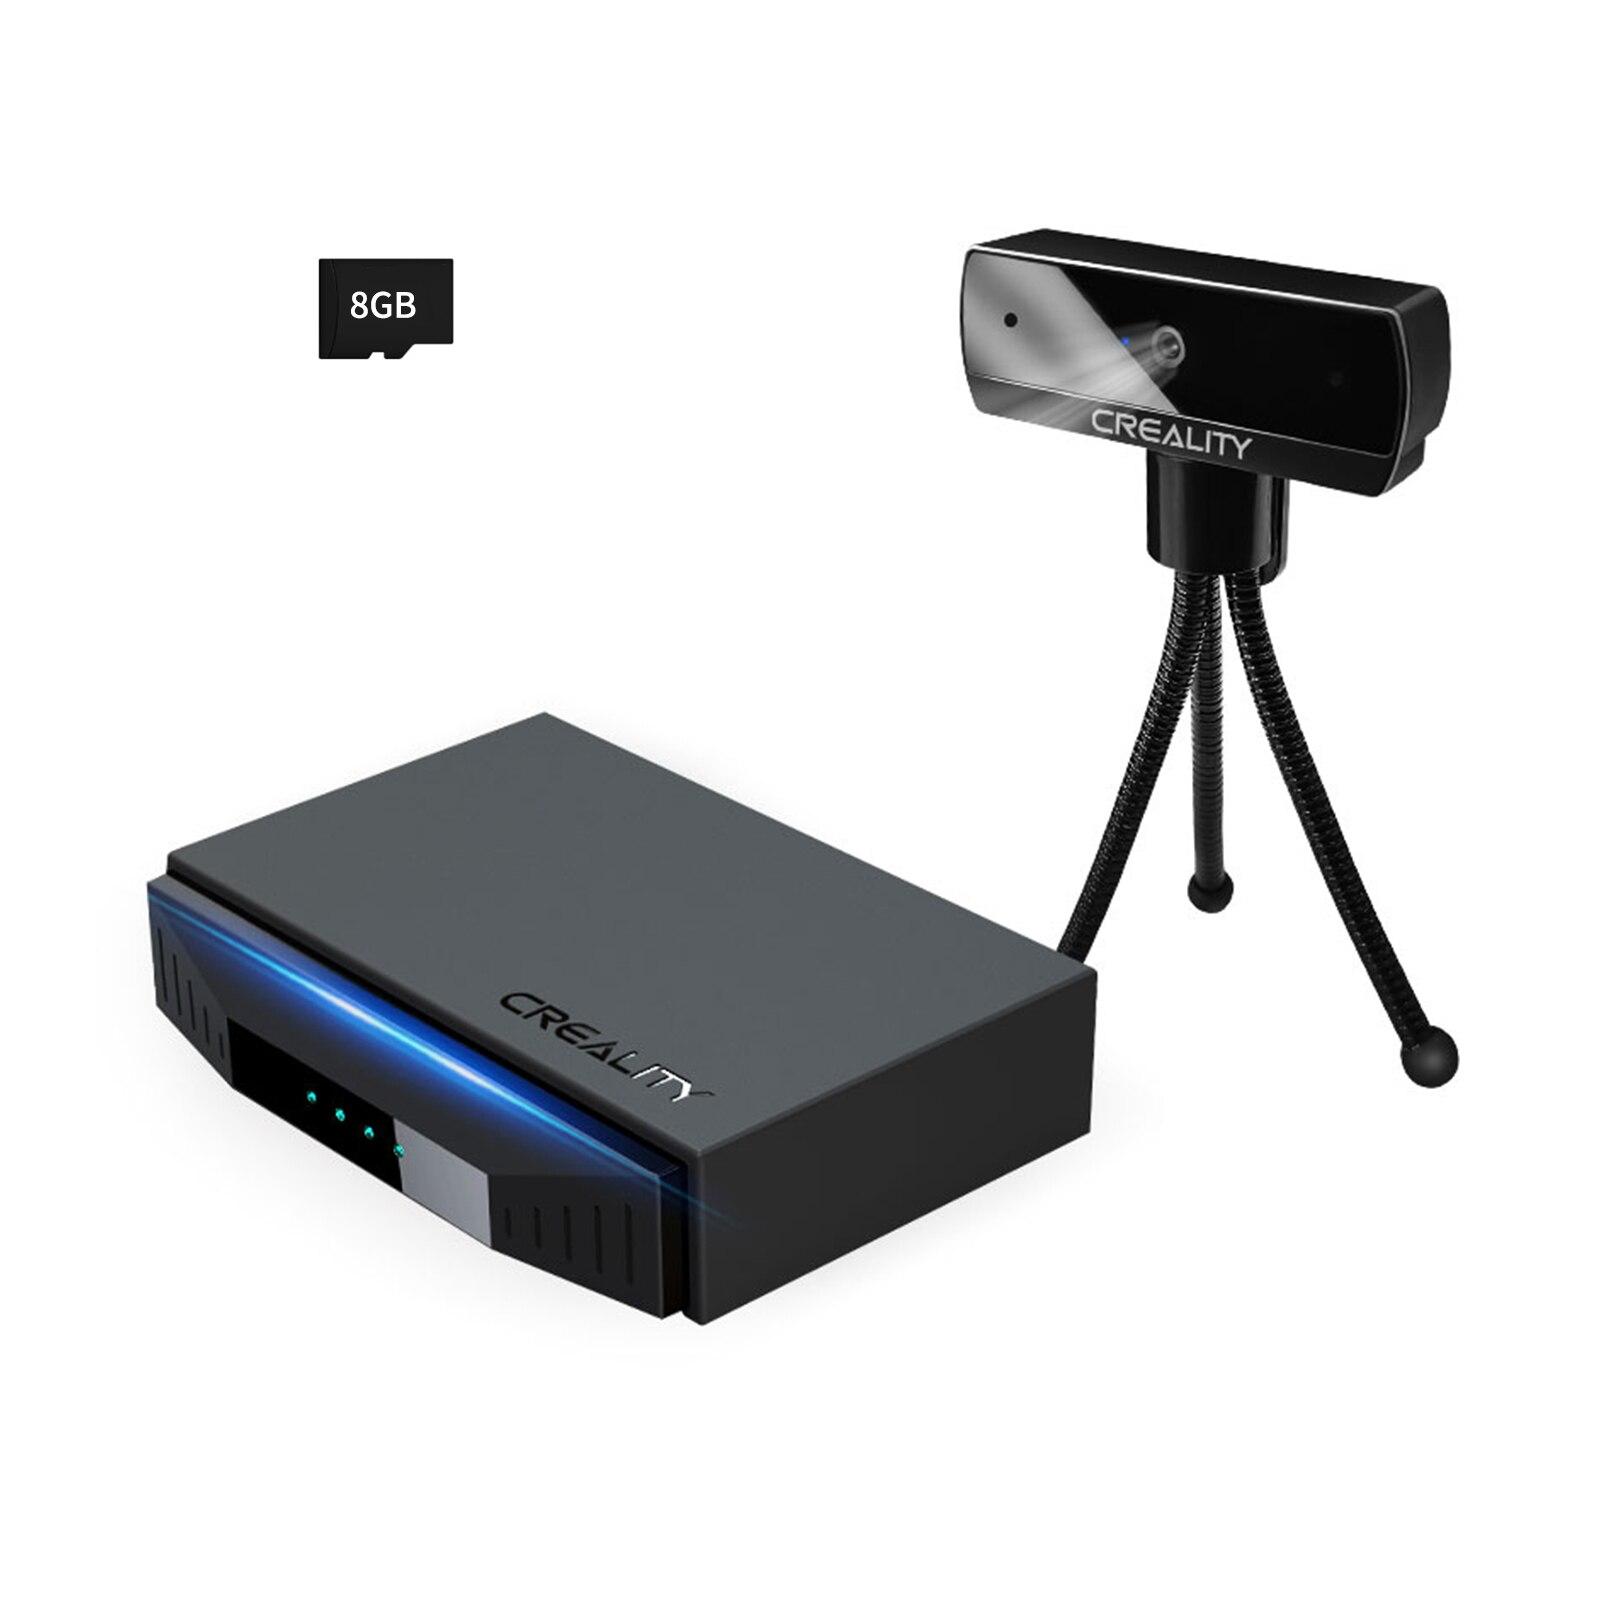 Creality 3D طابعة كاميرا كيت 8G TF بطاقة واي فاي مربع عن بعد ذكي مربع ل CR-10 Ender-3 CR-6 SE Ender-6 3d طابعة